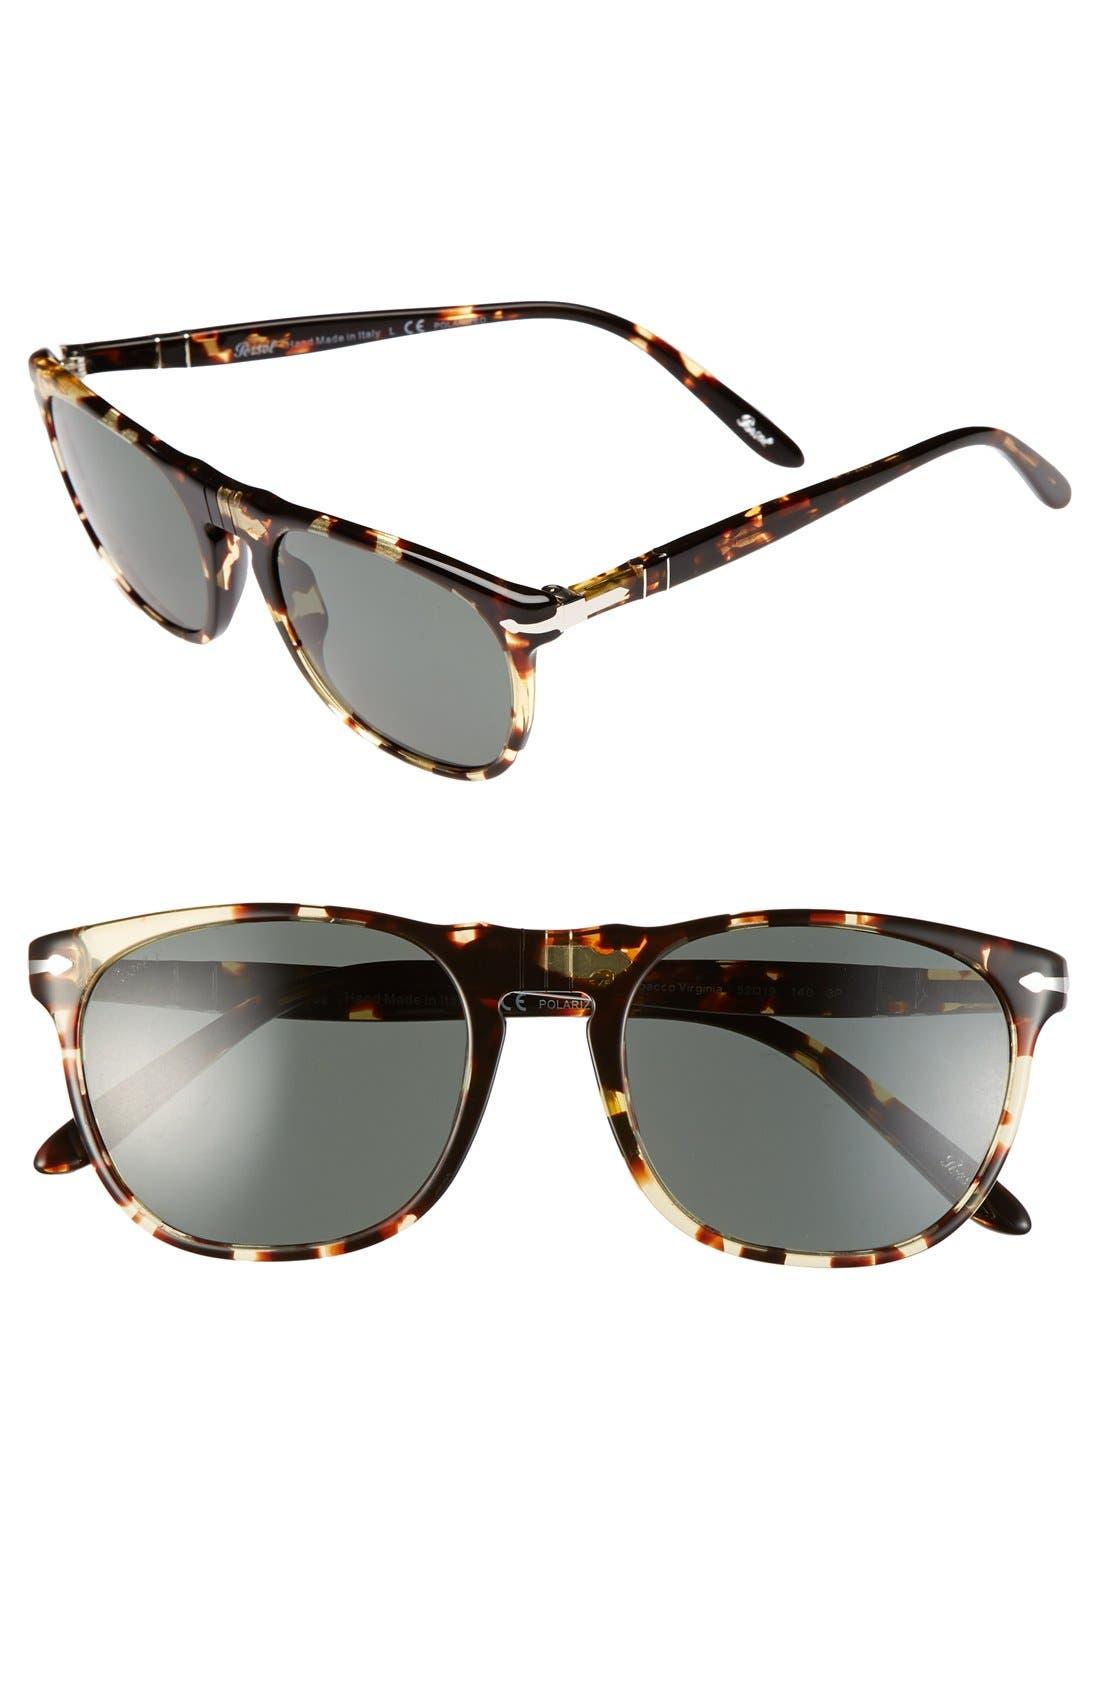 Main Image - Persol 52mm Retro Keyhole Sunglasses